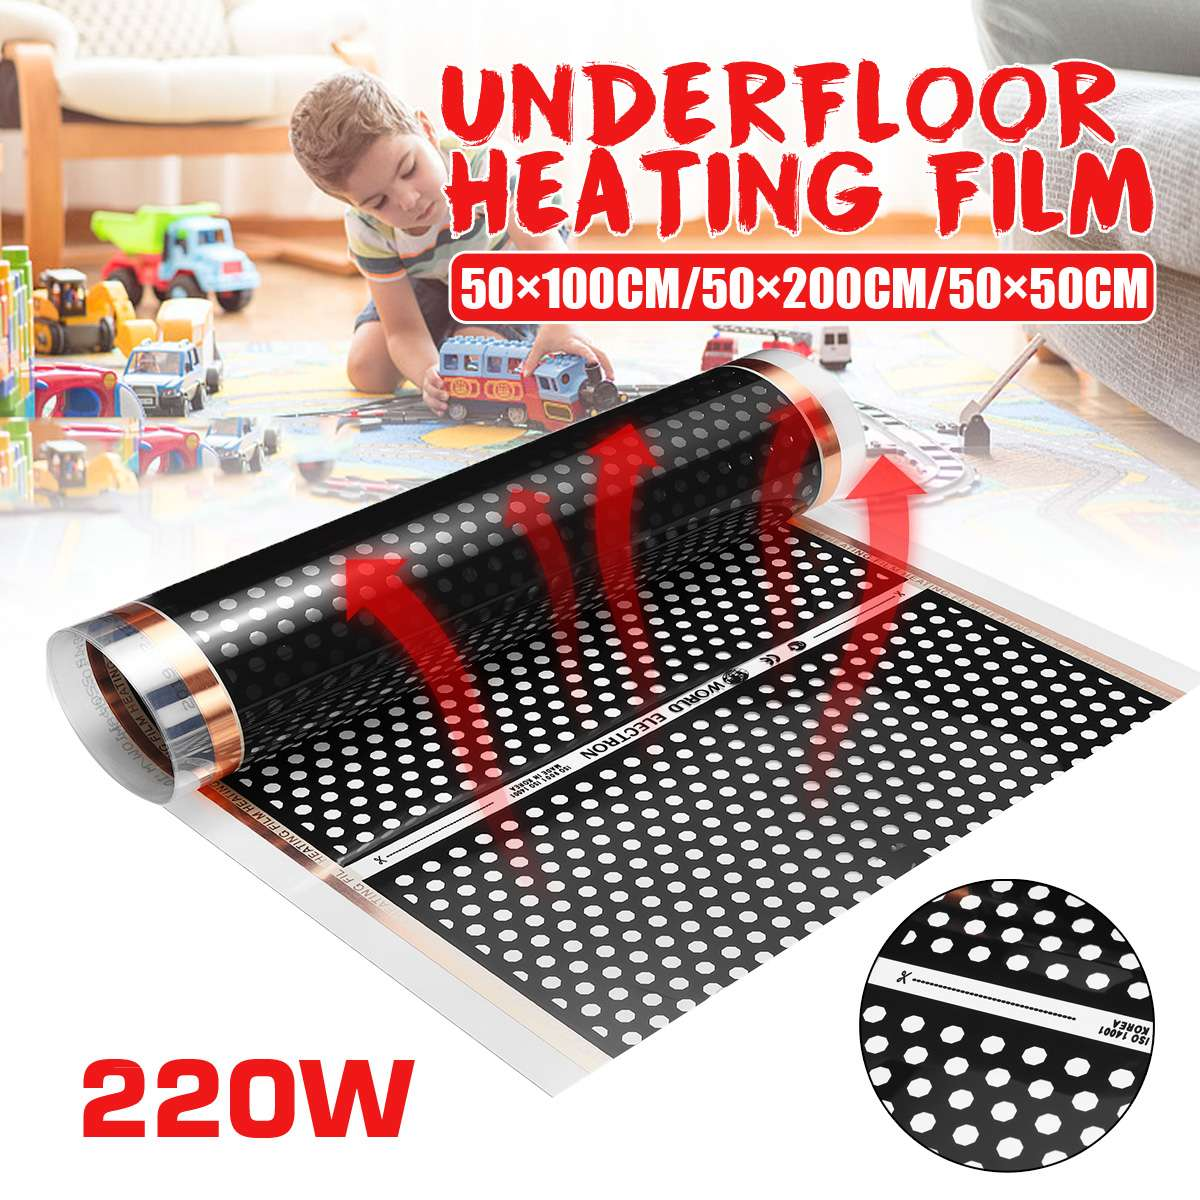 50cm Underfloor Infrared Heater Electric Floor Heating Film Floor Warmer Warm Mat Laminate / Solid Flooring Heating System